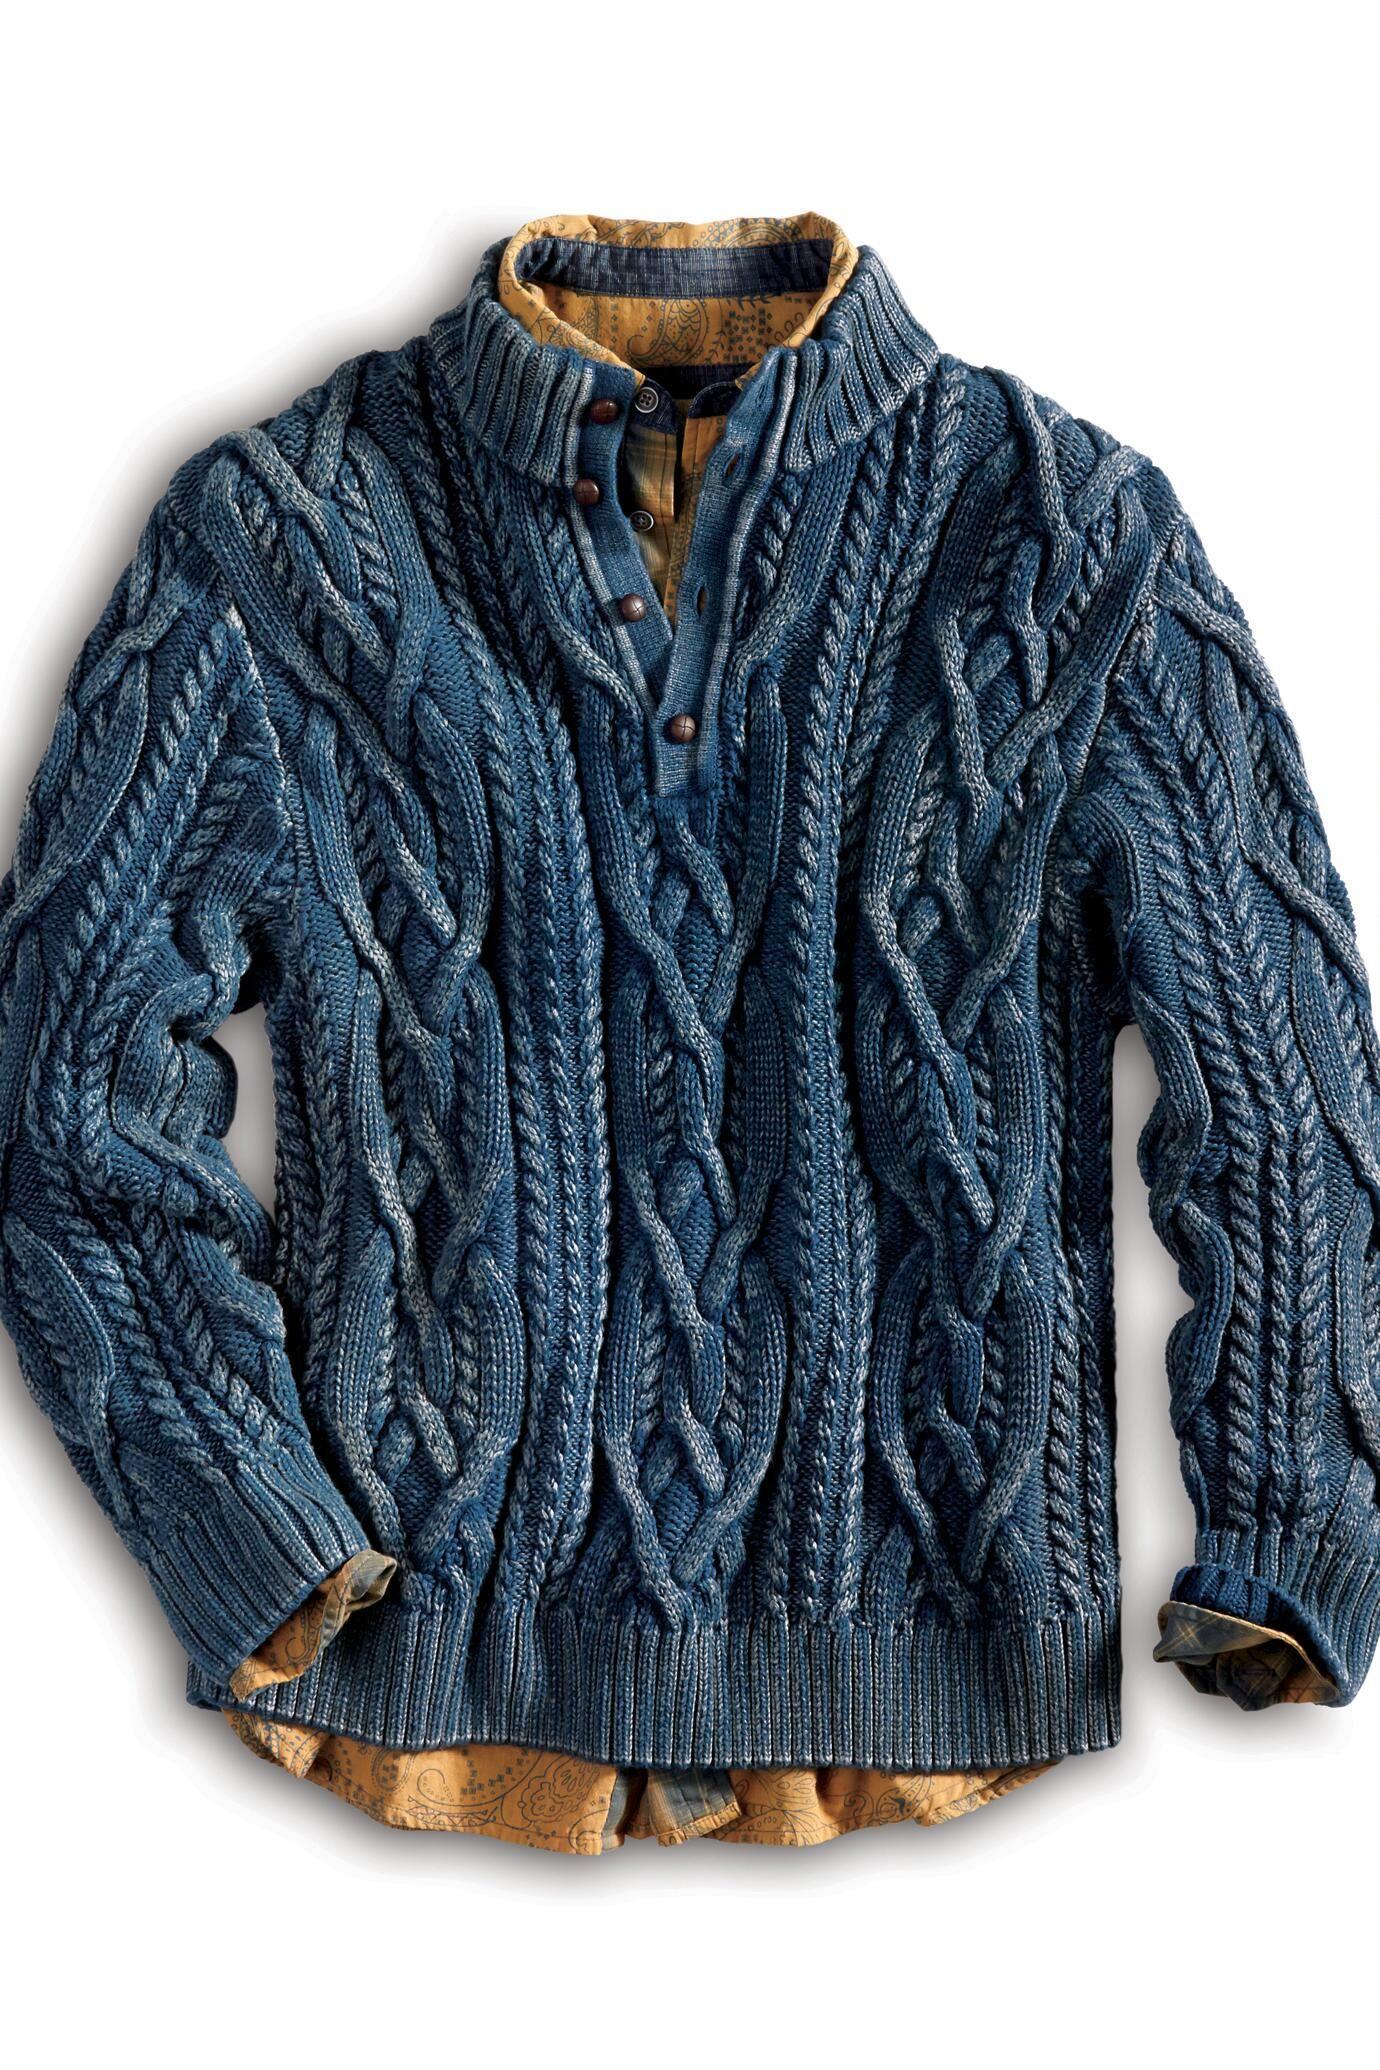 Cumulonimbus Indigo Cable Mockneck Sweater Territory